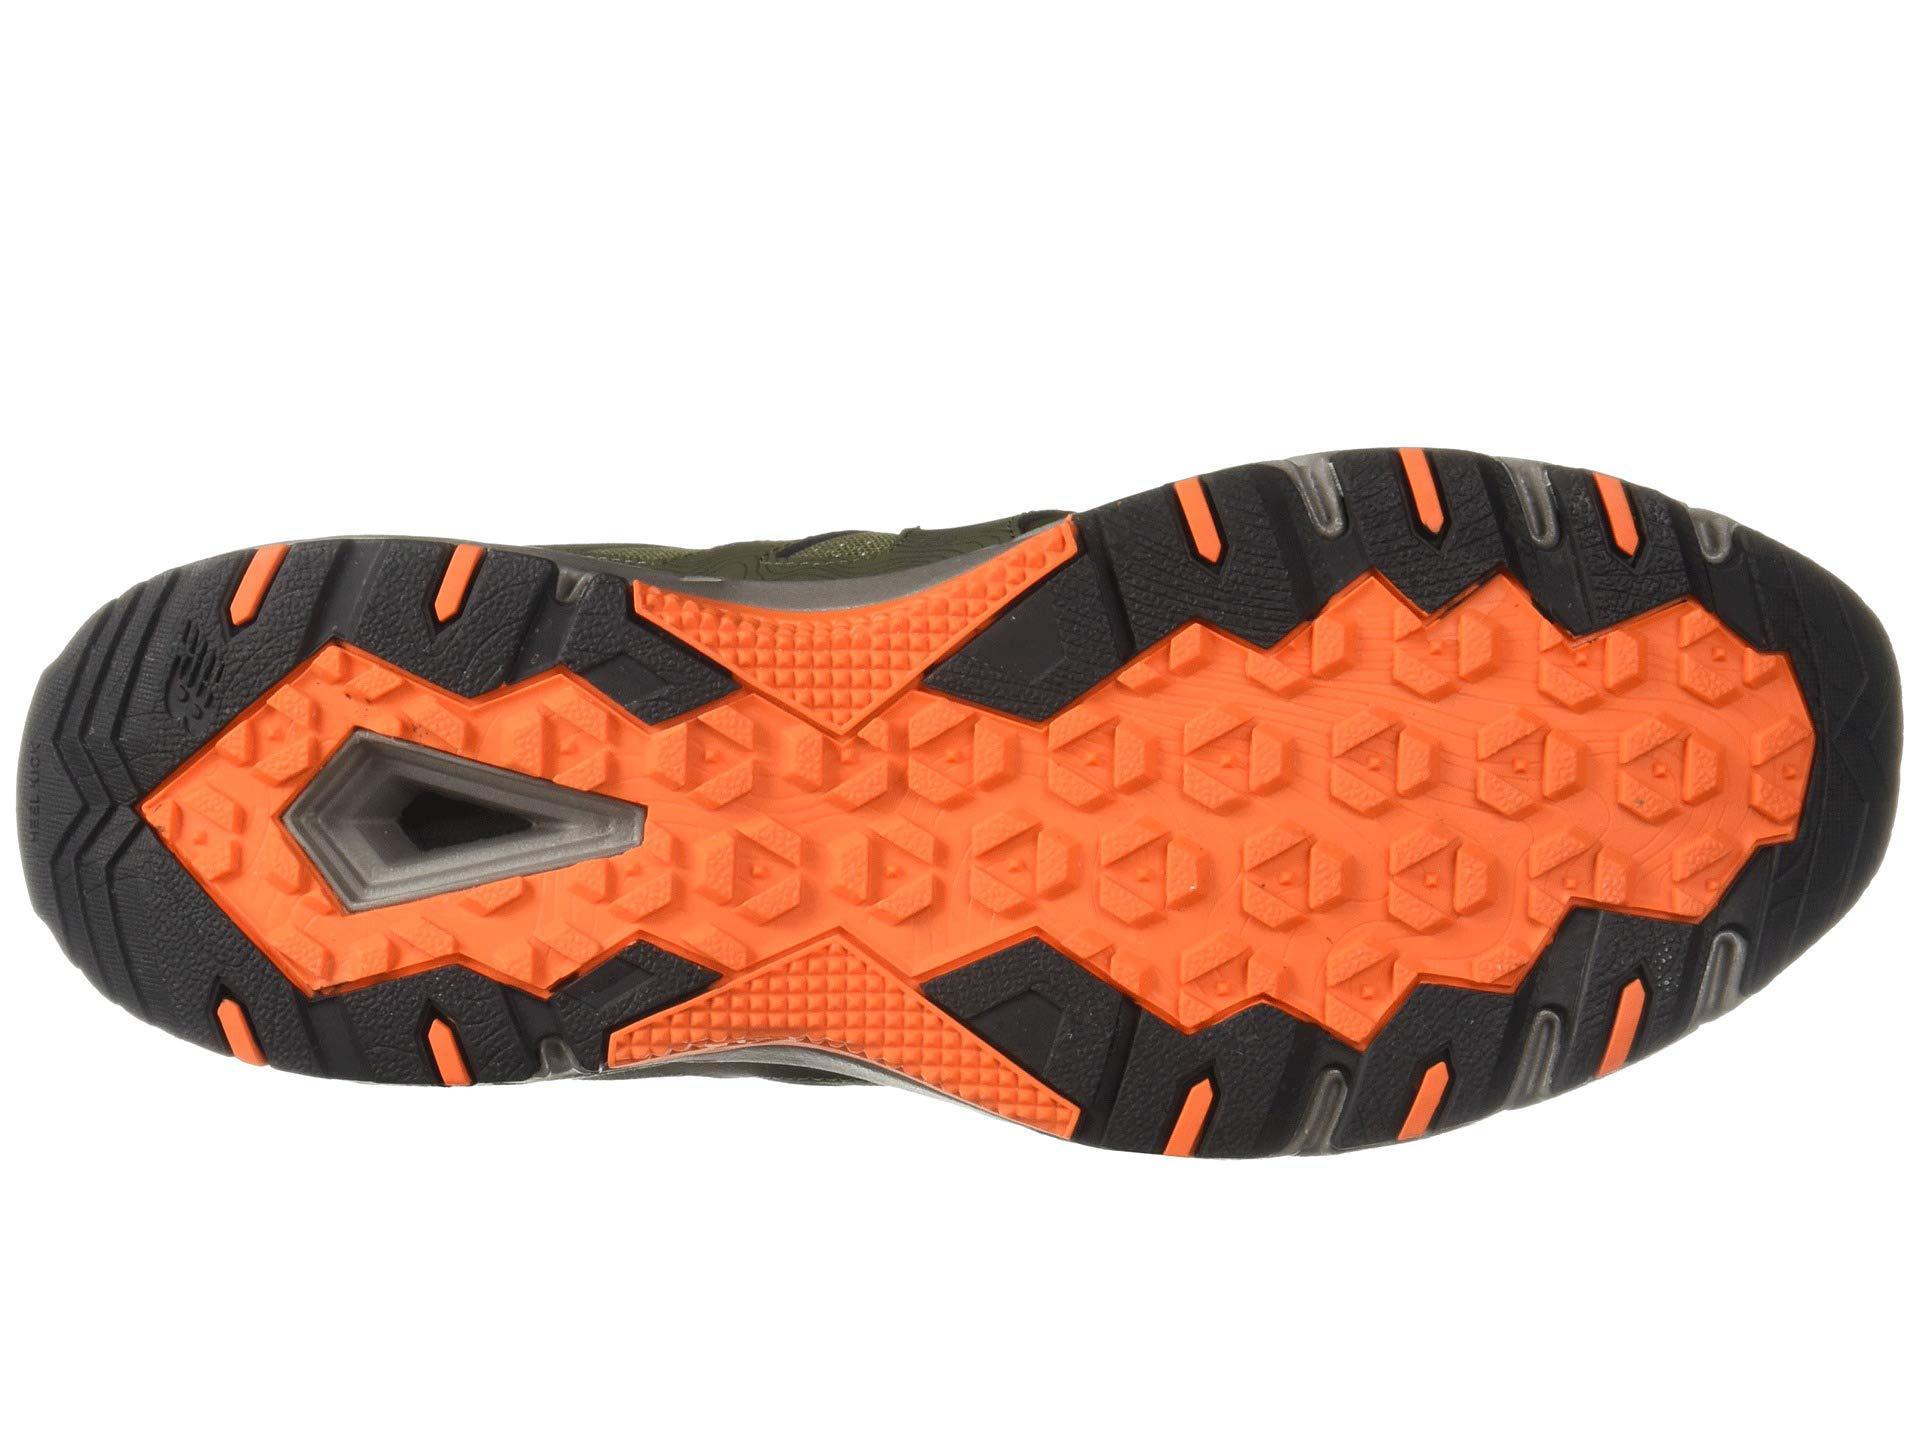 Lyst New Balance 510v4 Dark Covert Green Phantom Bengal Tiger Trumph Boots Darkbrown View Fullscreen